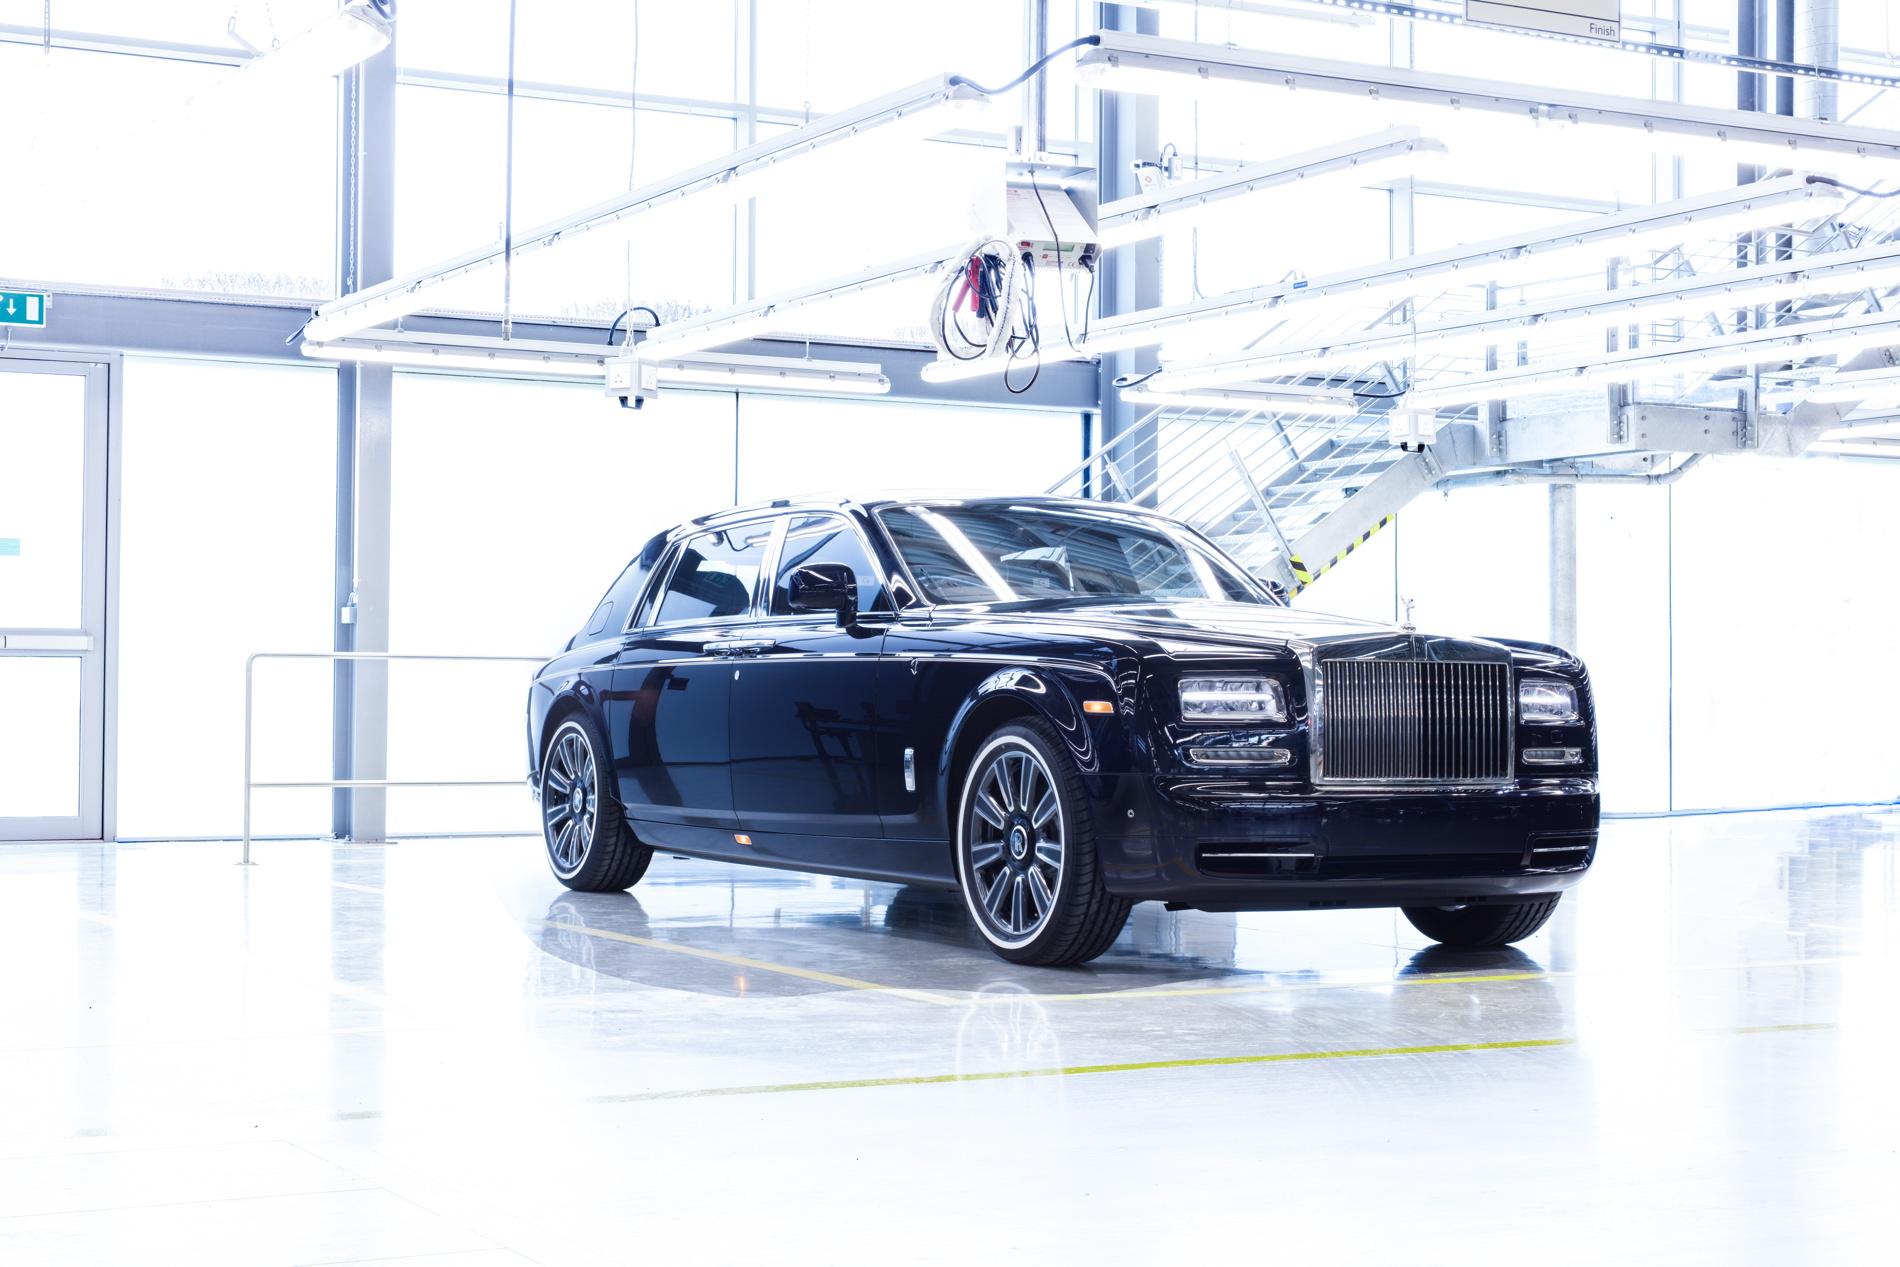 Final Phantom Rolls Royce Celebrates End of Generation VI 06